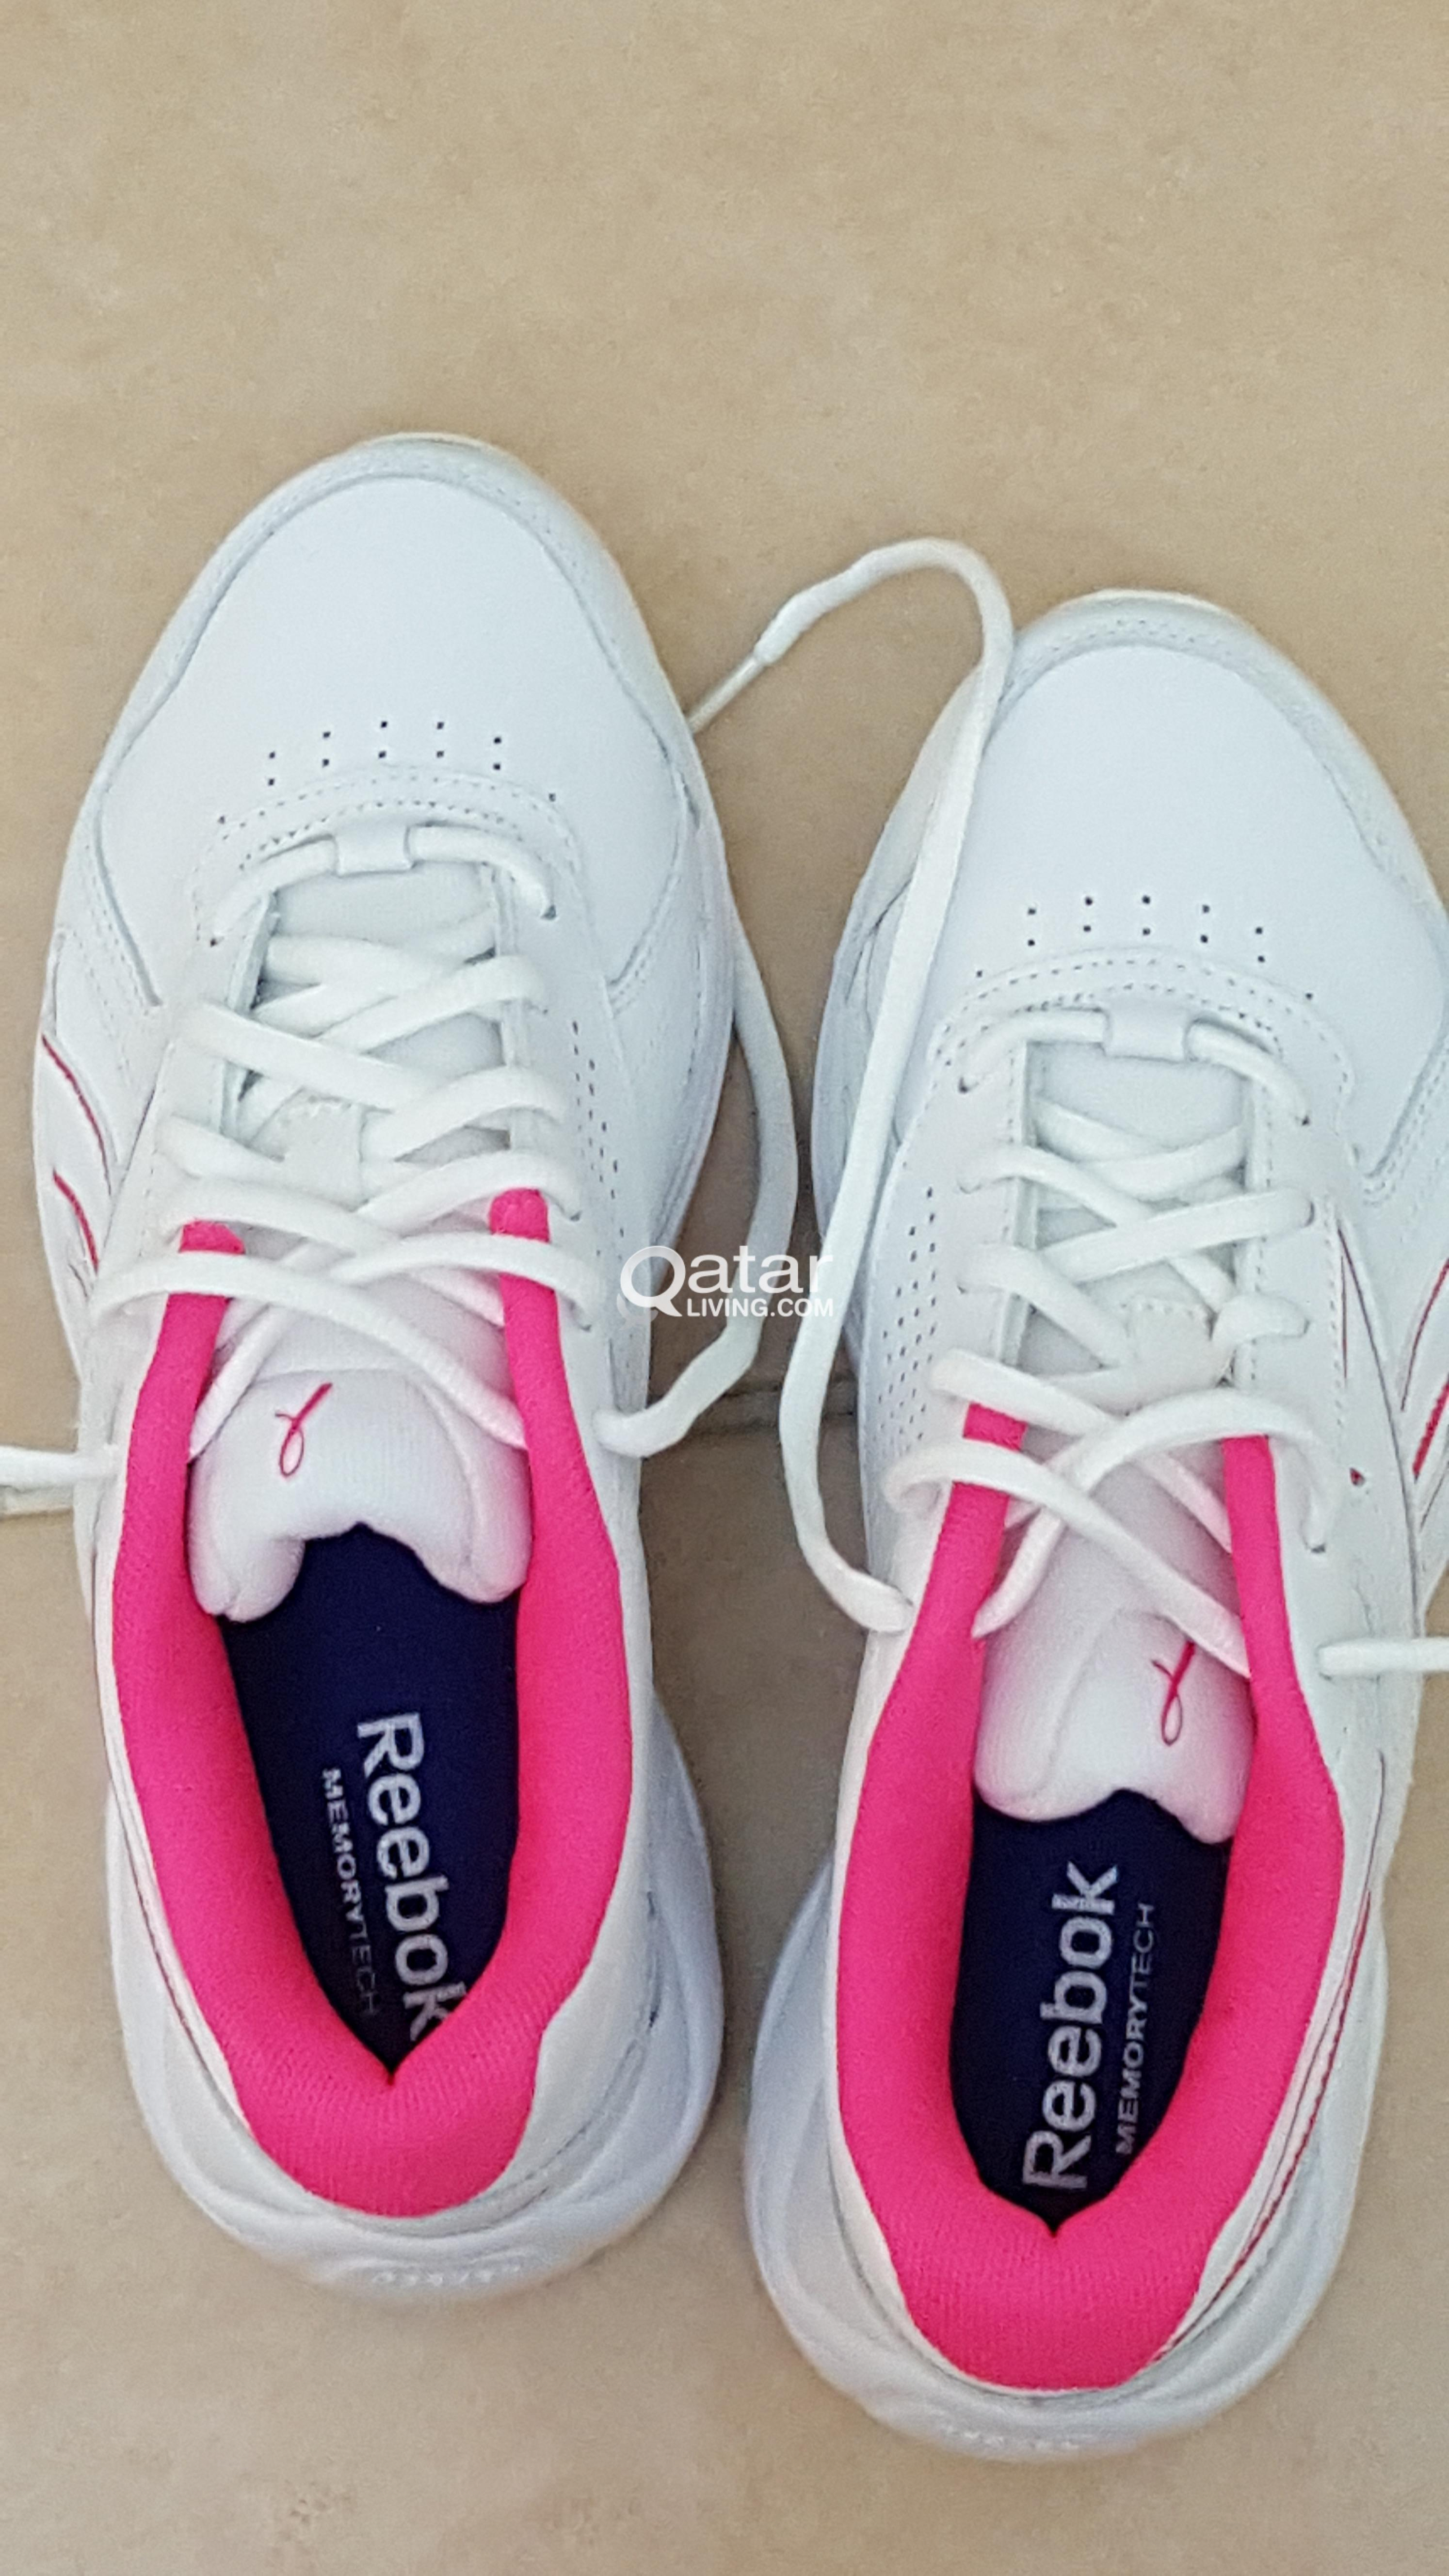 d537e33ad7628 Brand New Reebok Womens Ultra V Dmx Max White Walking Shoes Size 5.5 ...